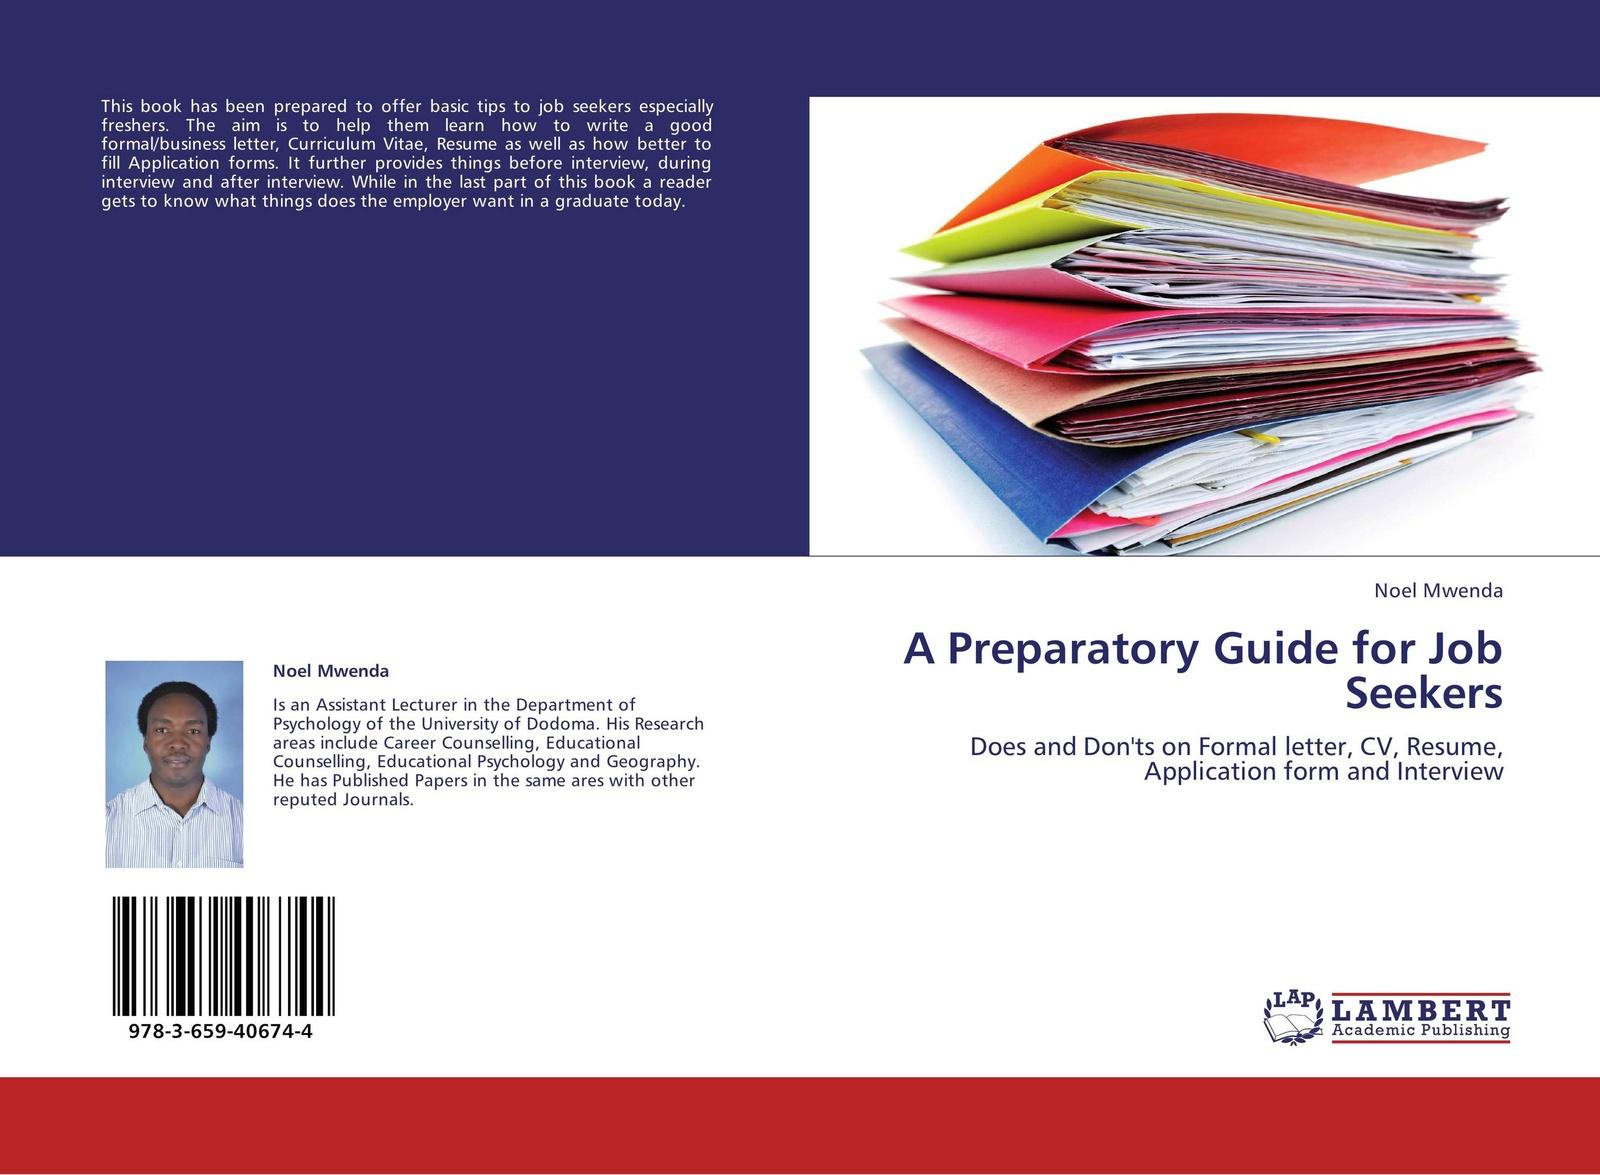 лучшая цена Noel Mwenda A Preparatory Guide for Job Seekers